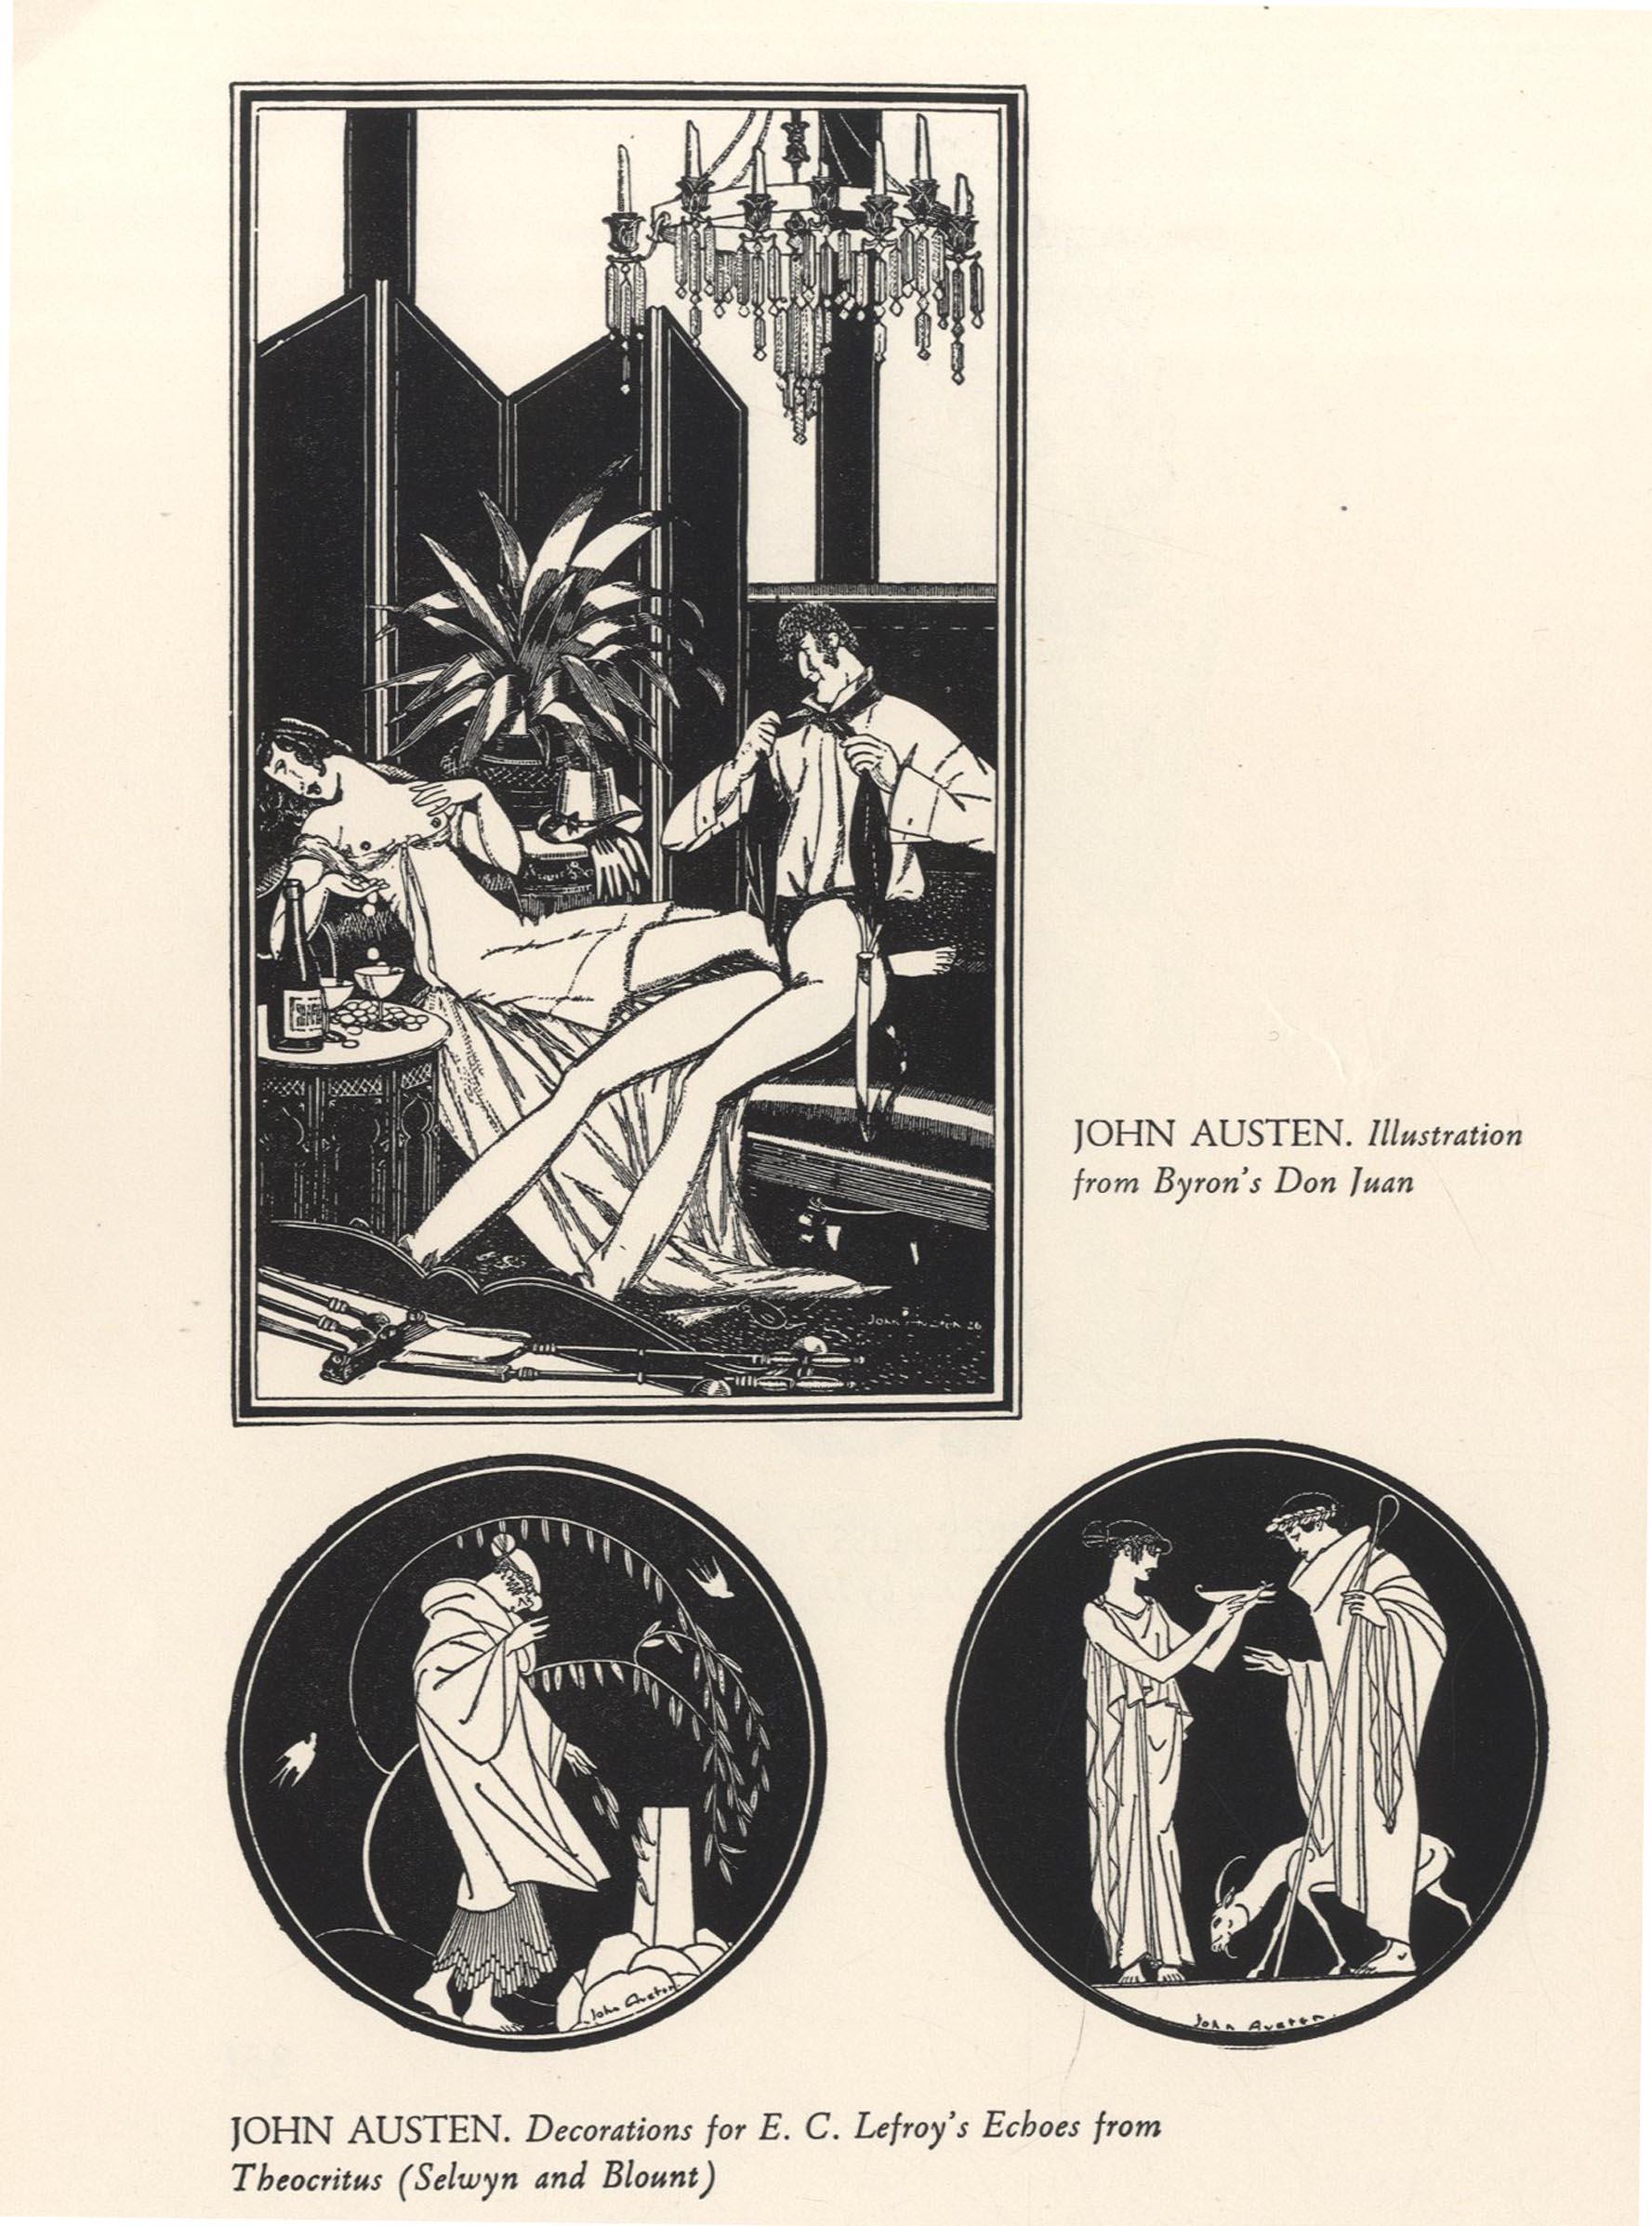 john austen u2019s haunting illustrations of shakespeare u2019s hamlet  a masterpiece of the aesthetic